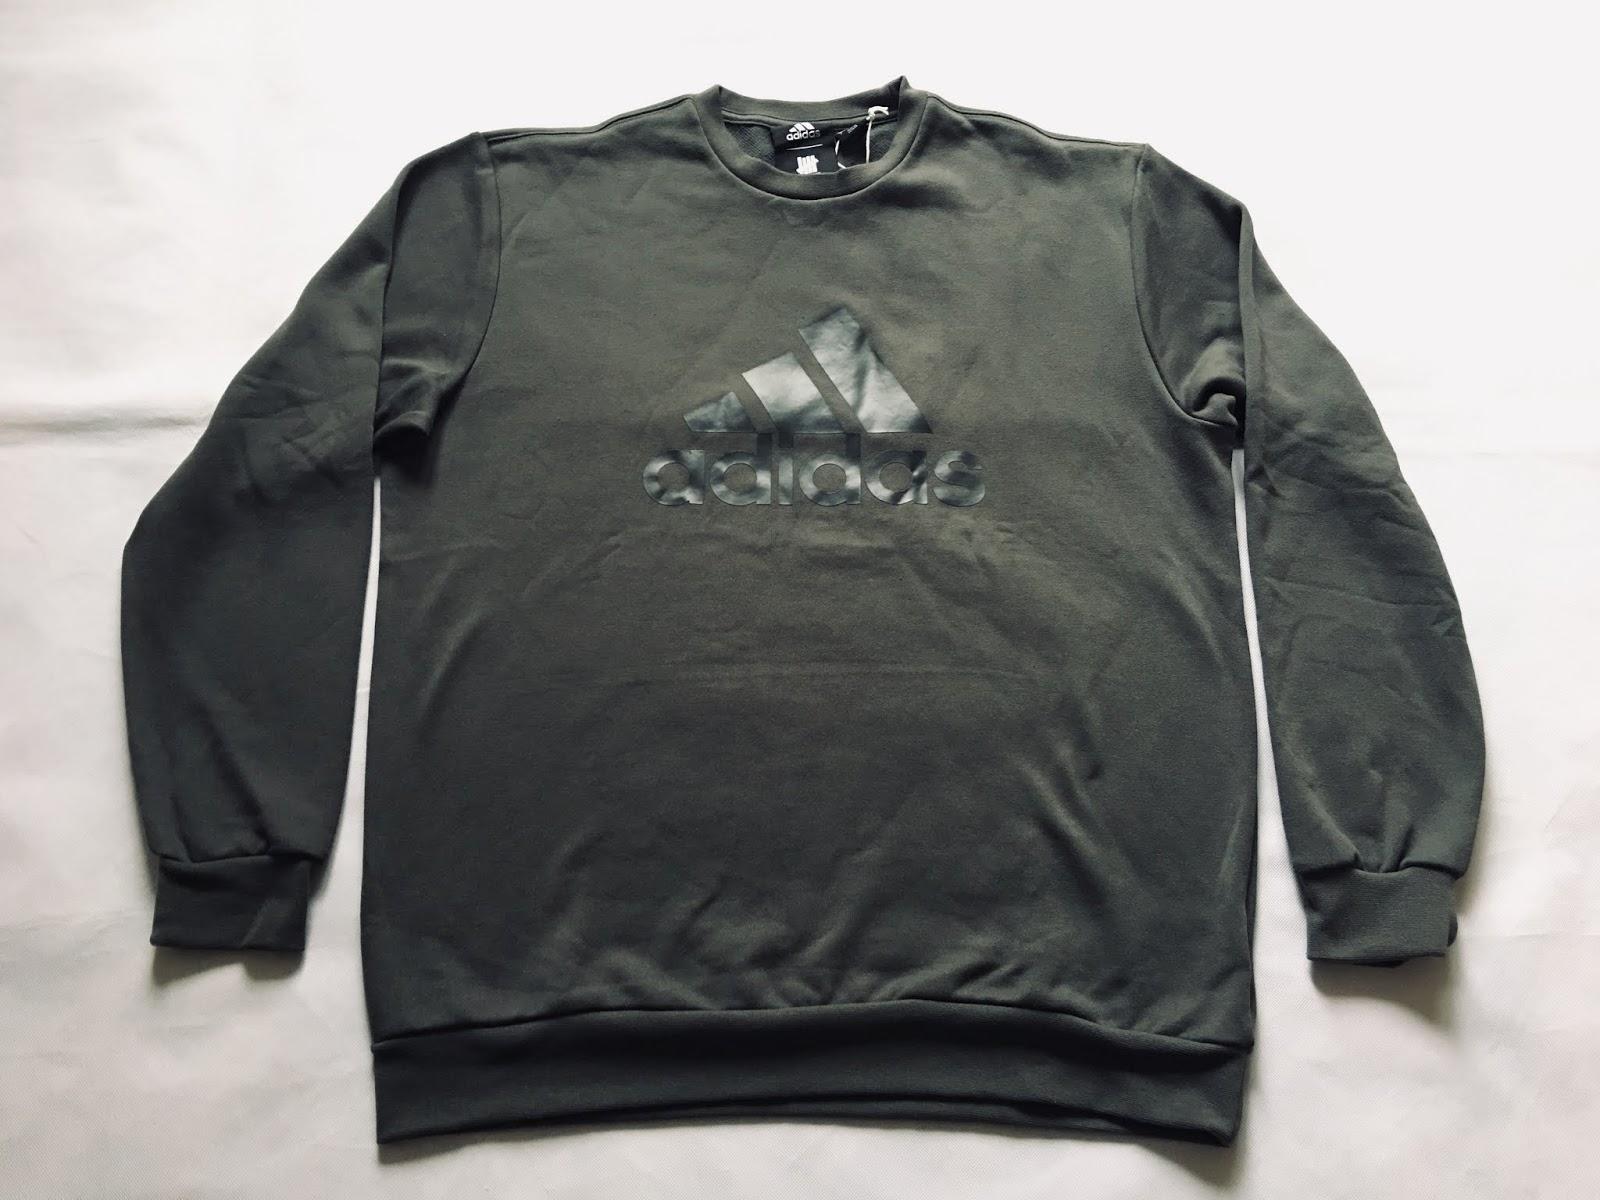 133a78a56707a6 Adidas x Undefeated Consortium Running Crewneck Sweatshirt DN8780